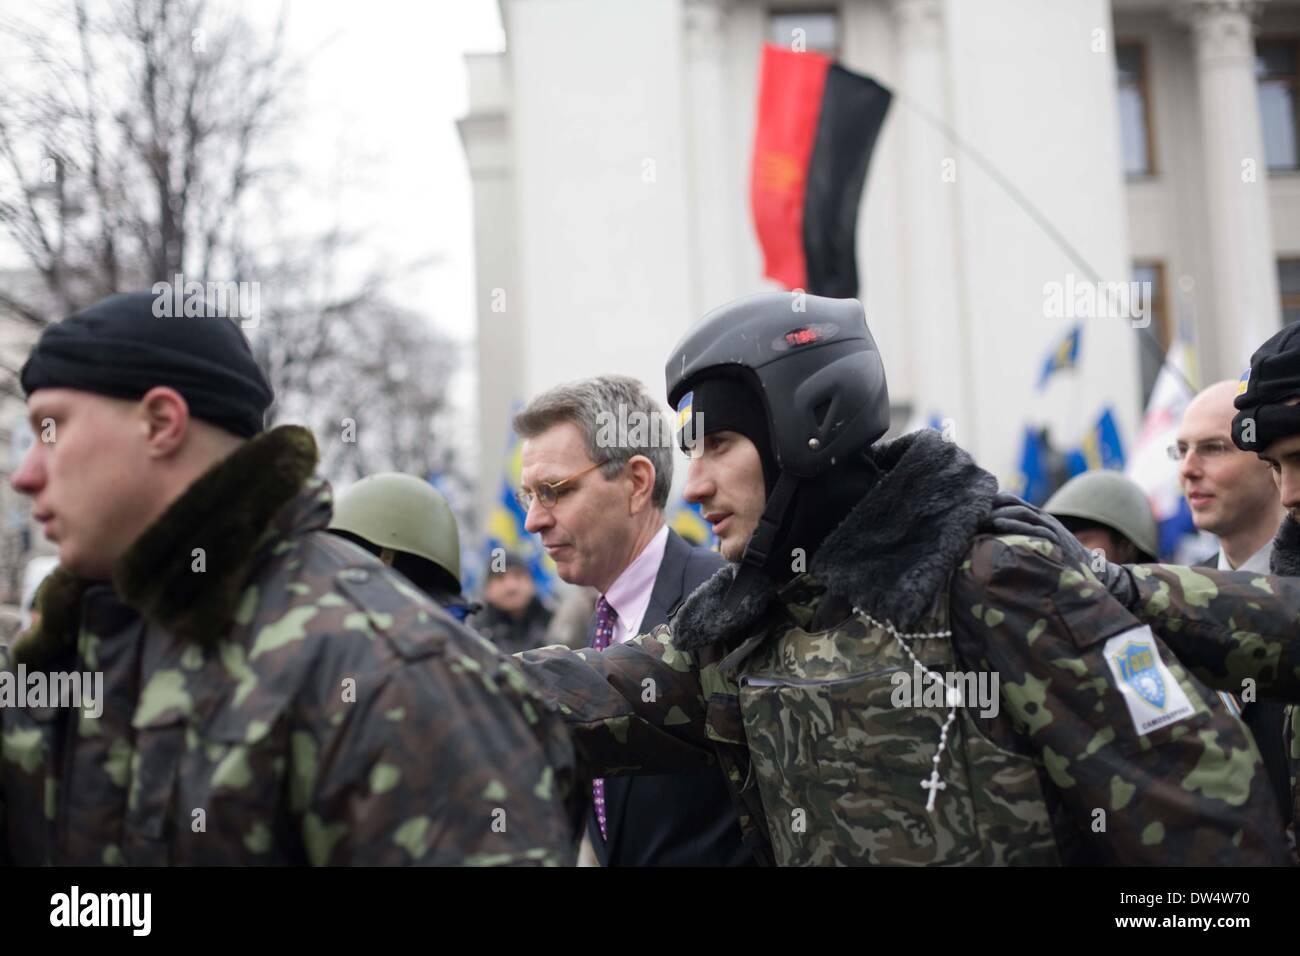 Ukrainian army disperses home